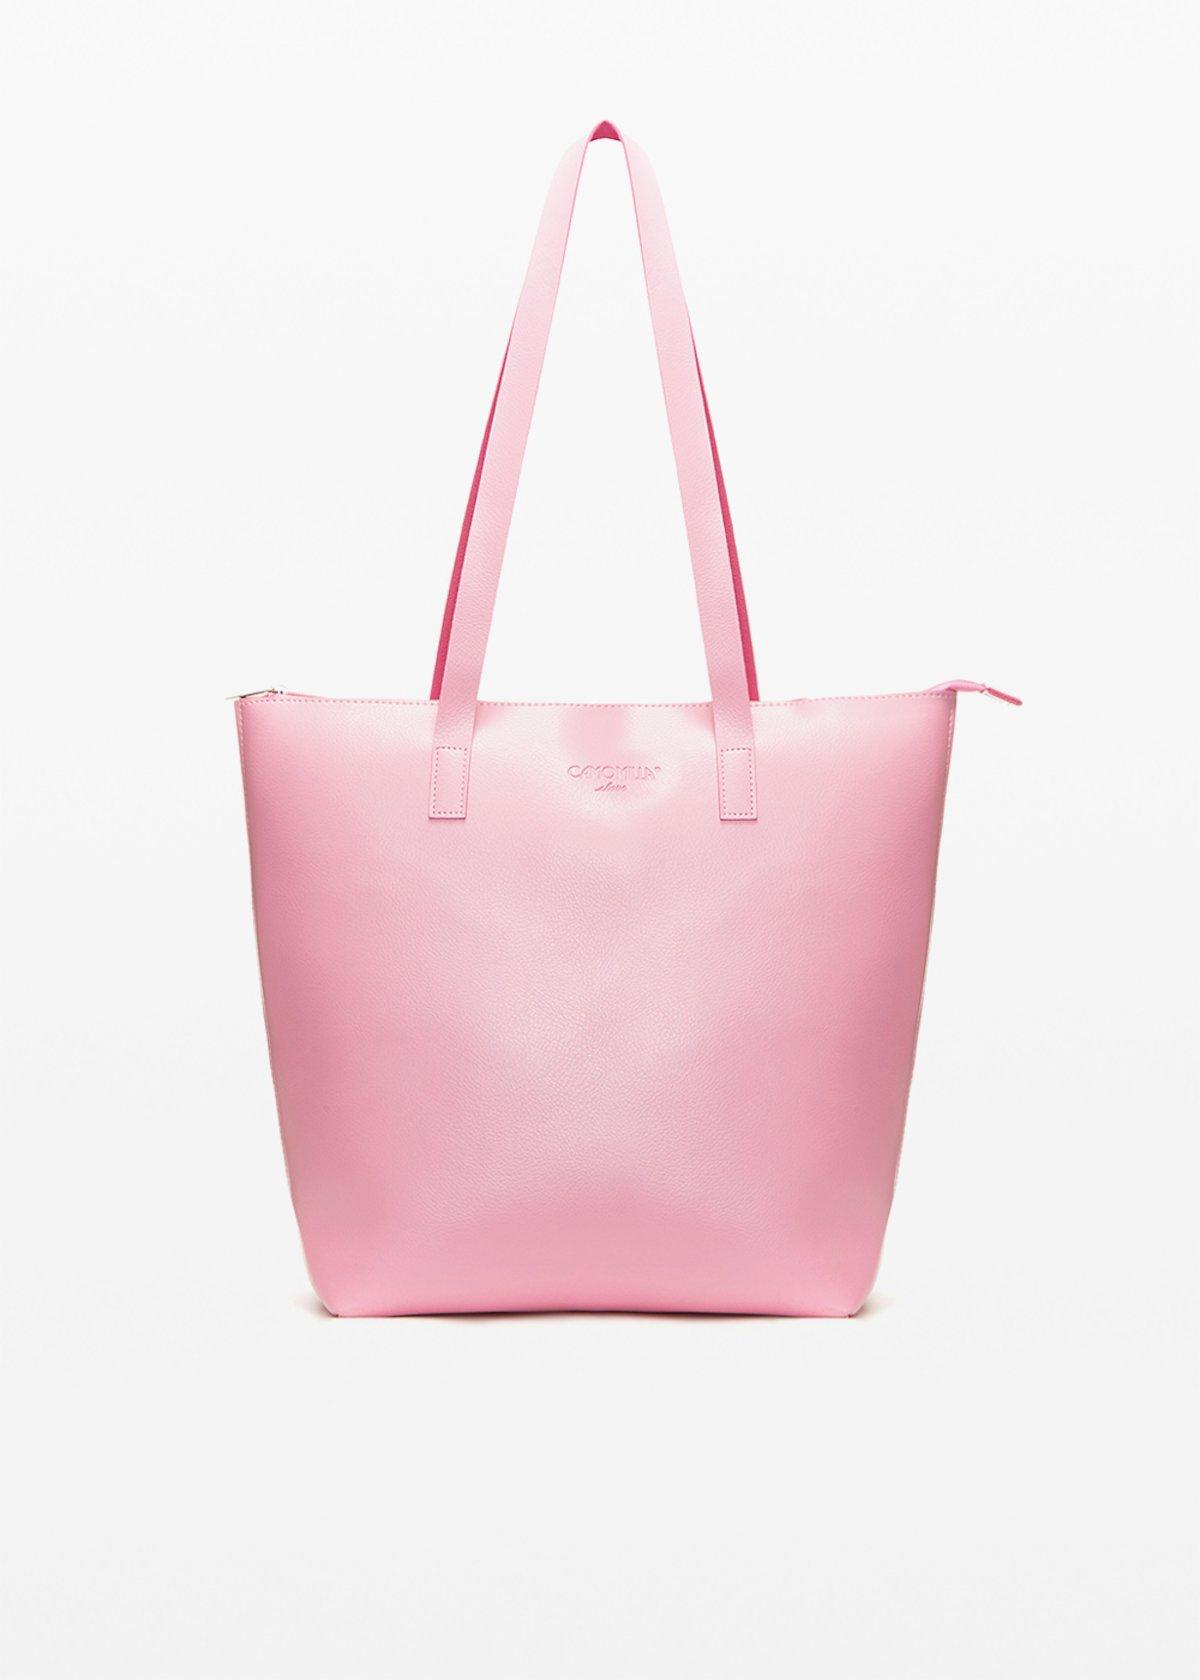 Faux leather Bilia6 shopping bag unlined double colour - Bubble / Hibiscus - Woman - Category image